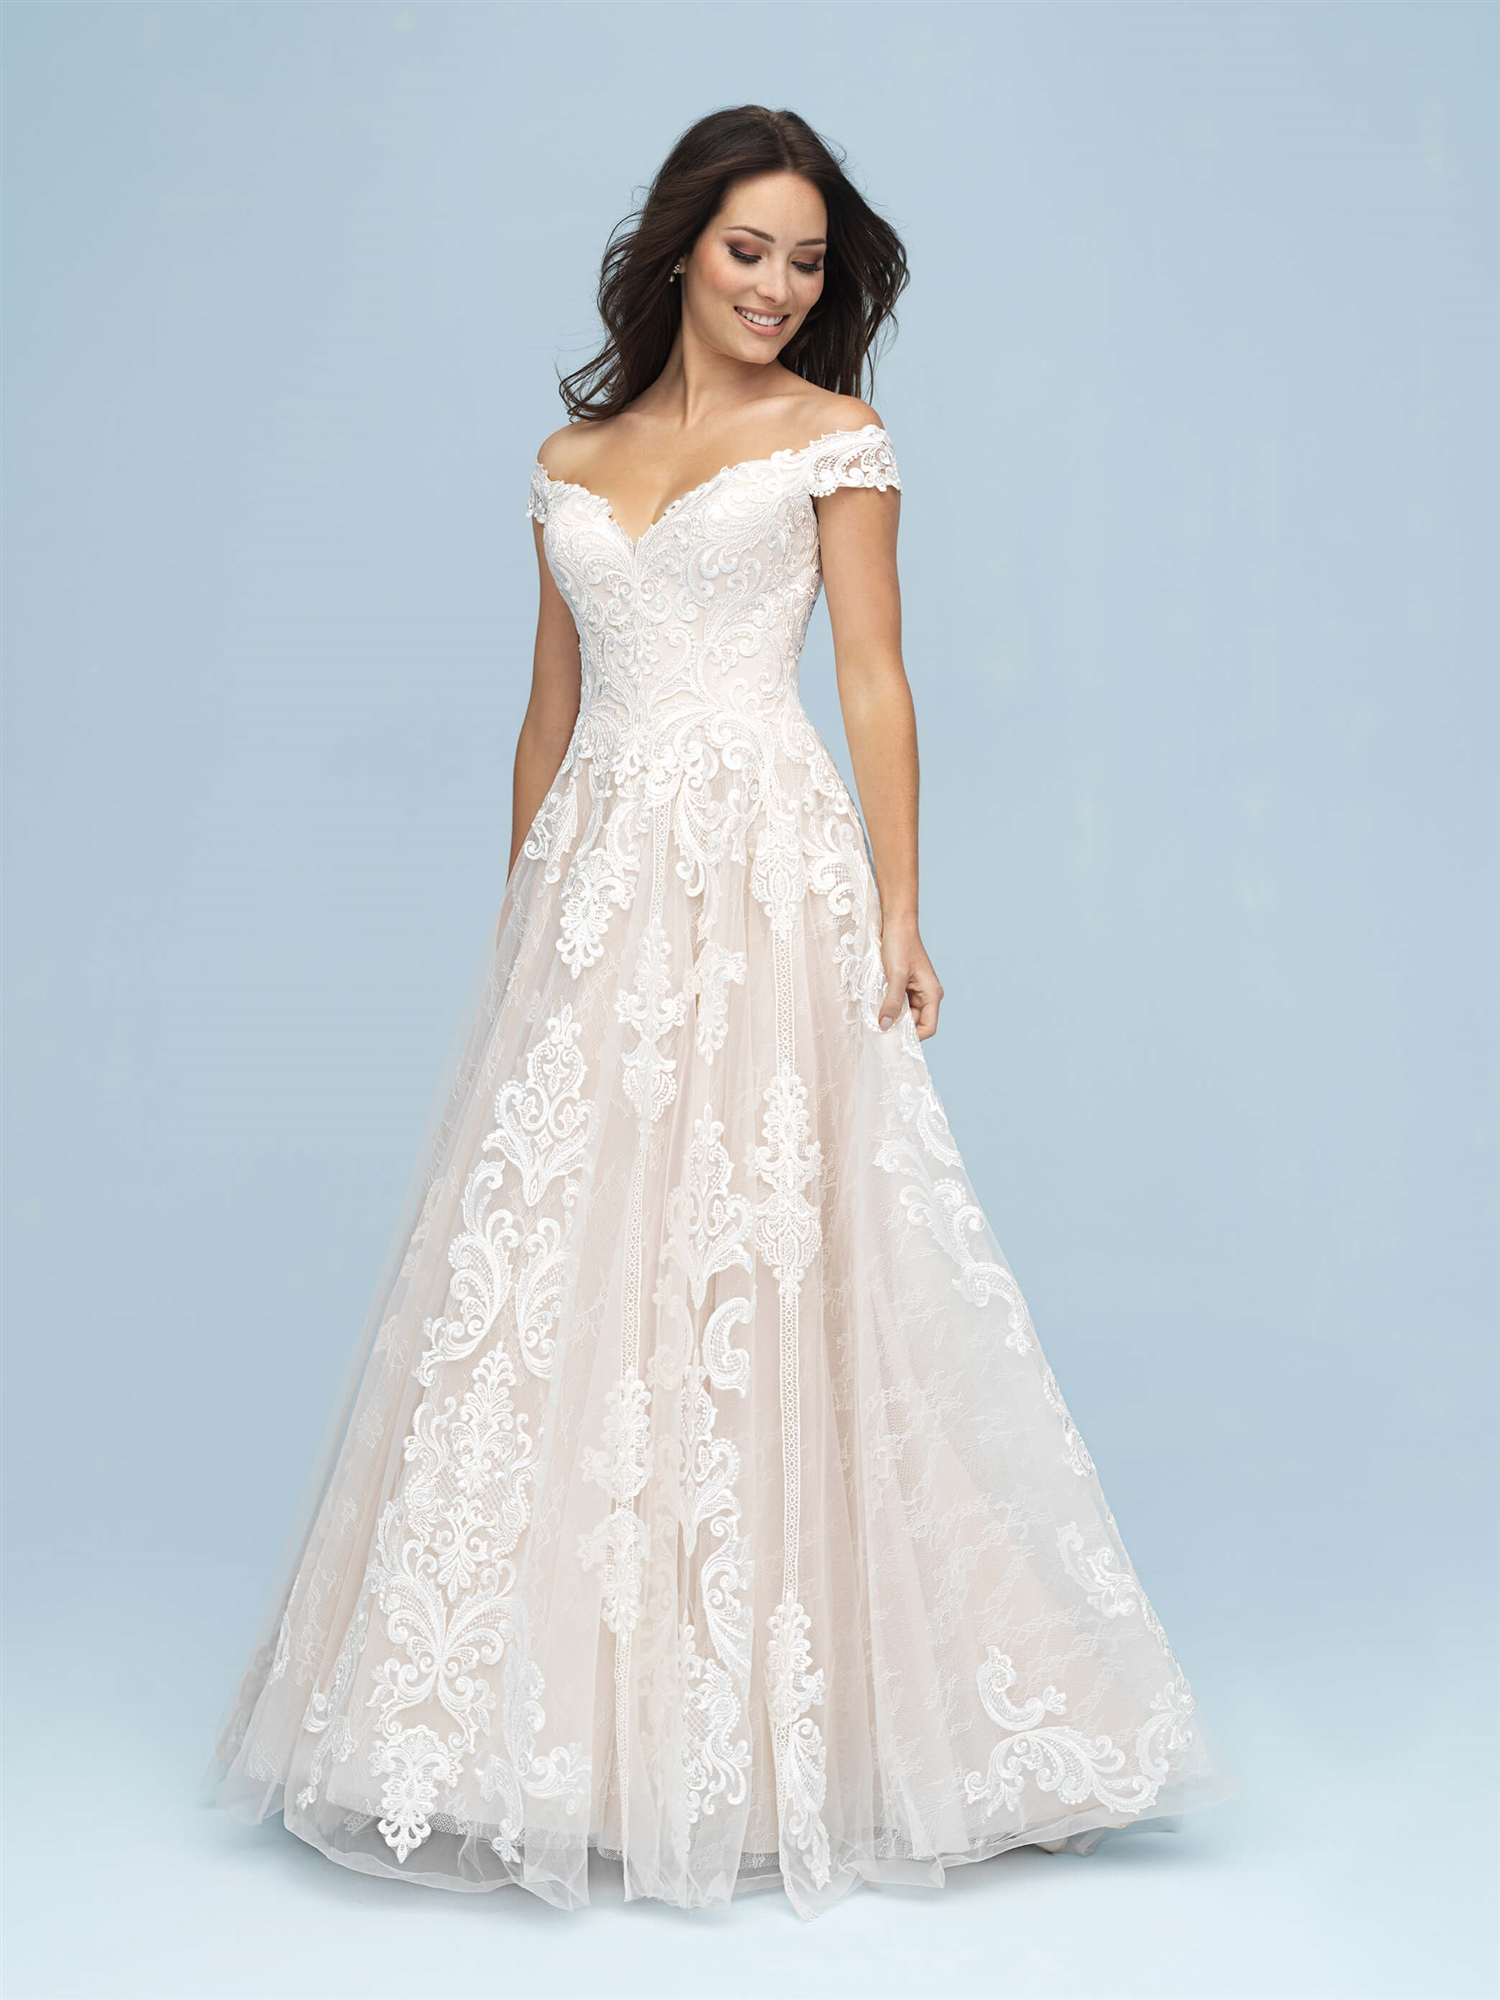 Allure Wedding Dresses.Allure Bridal Style 9619